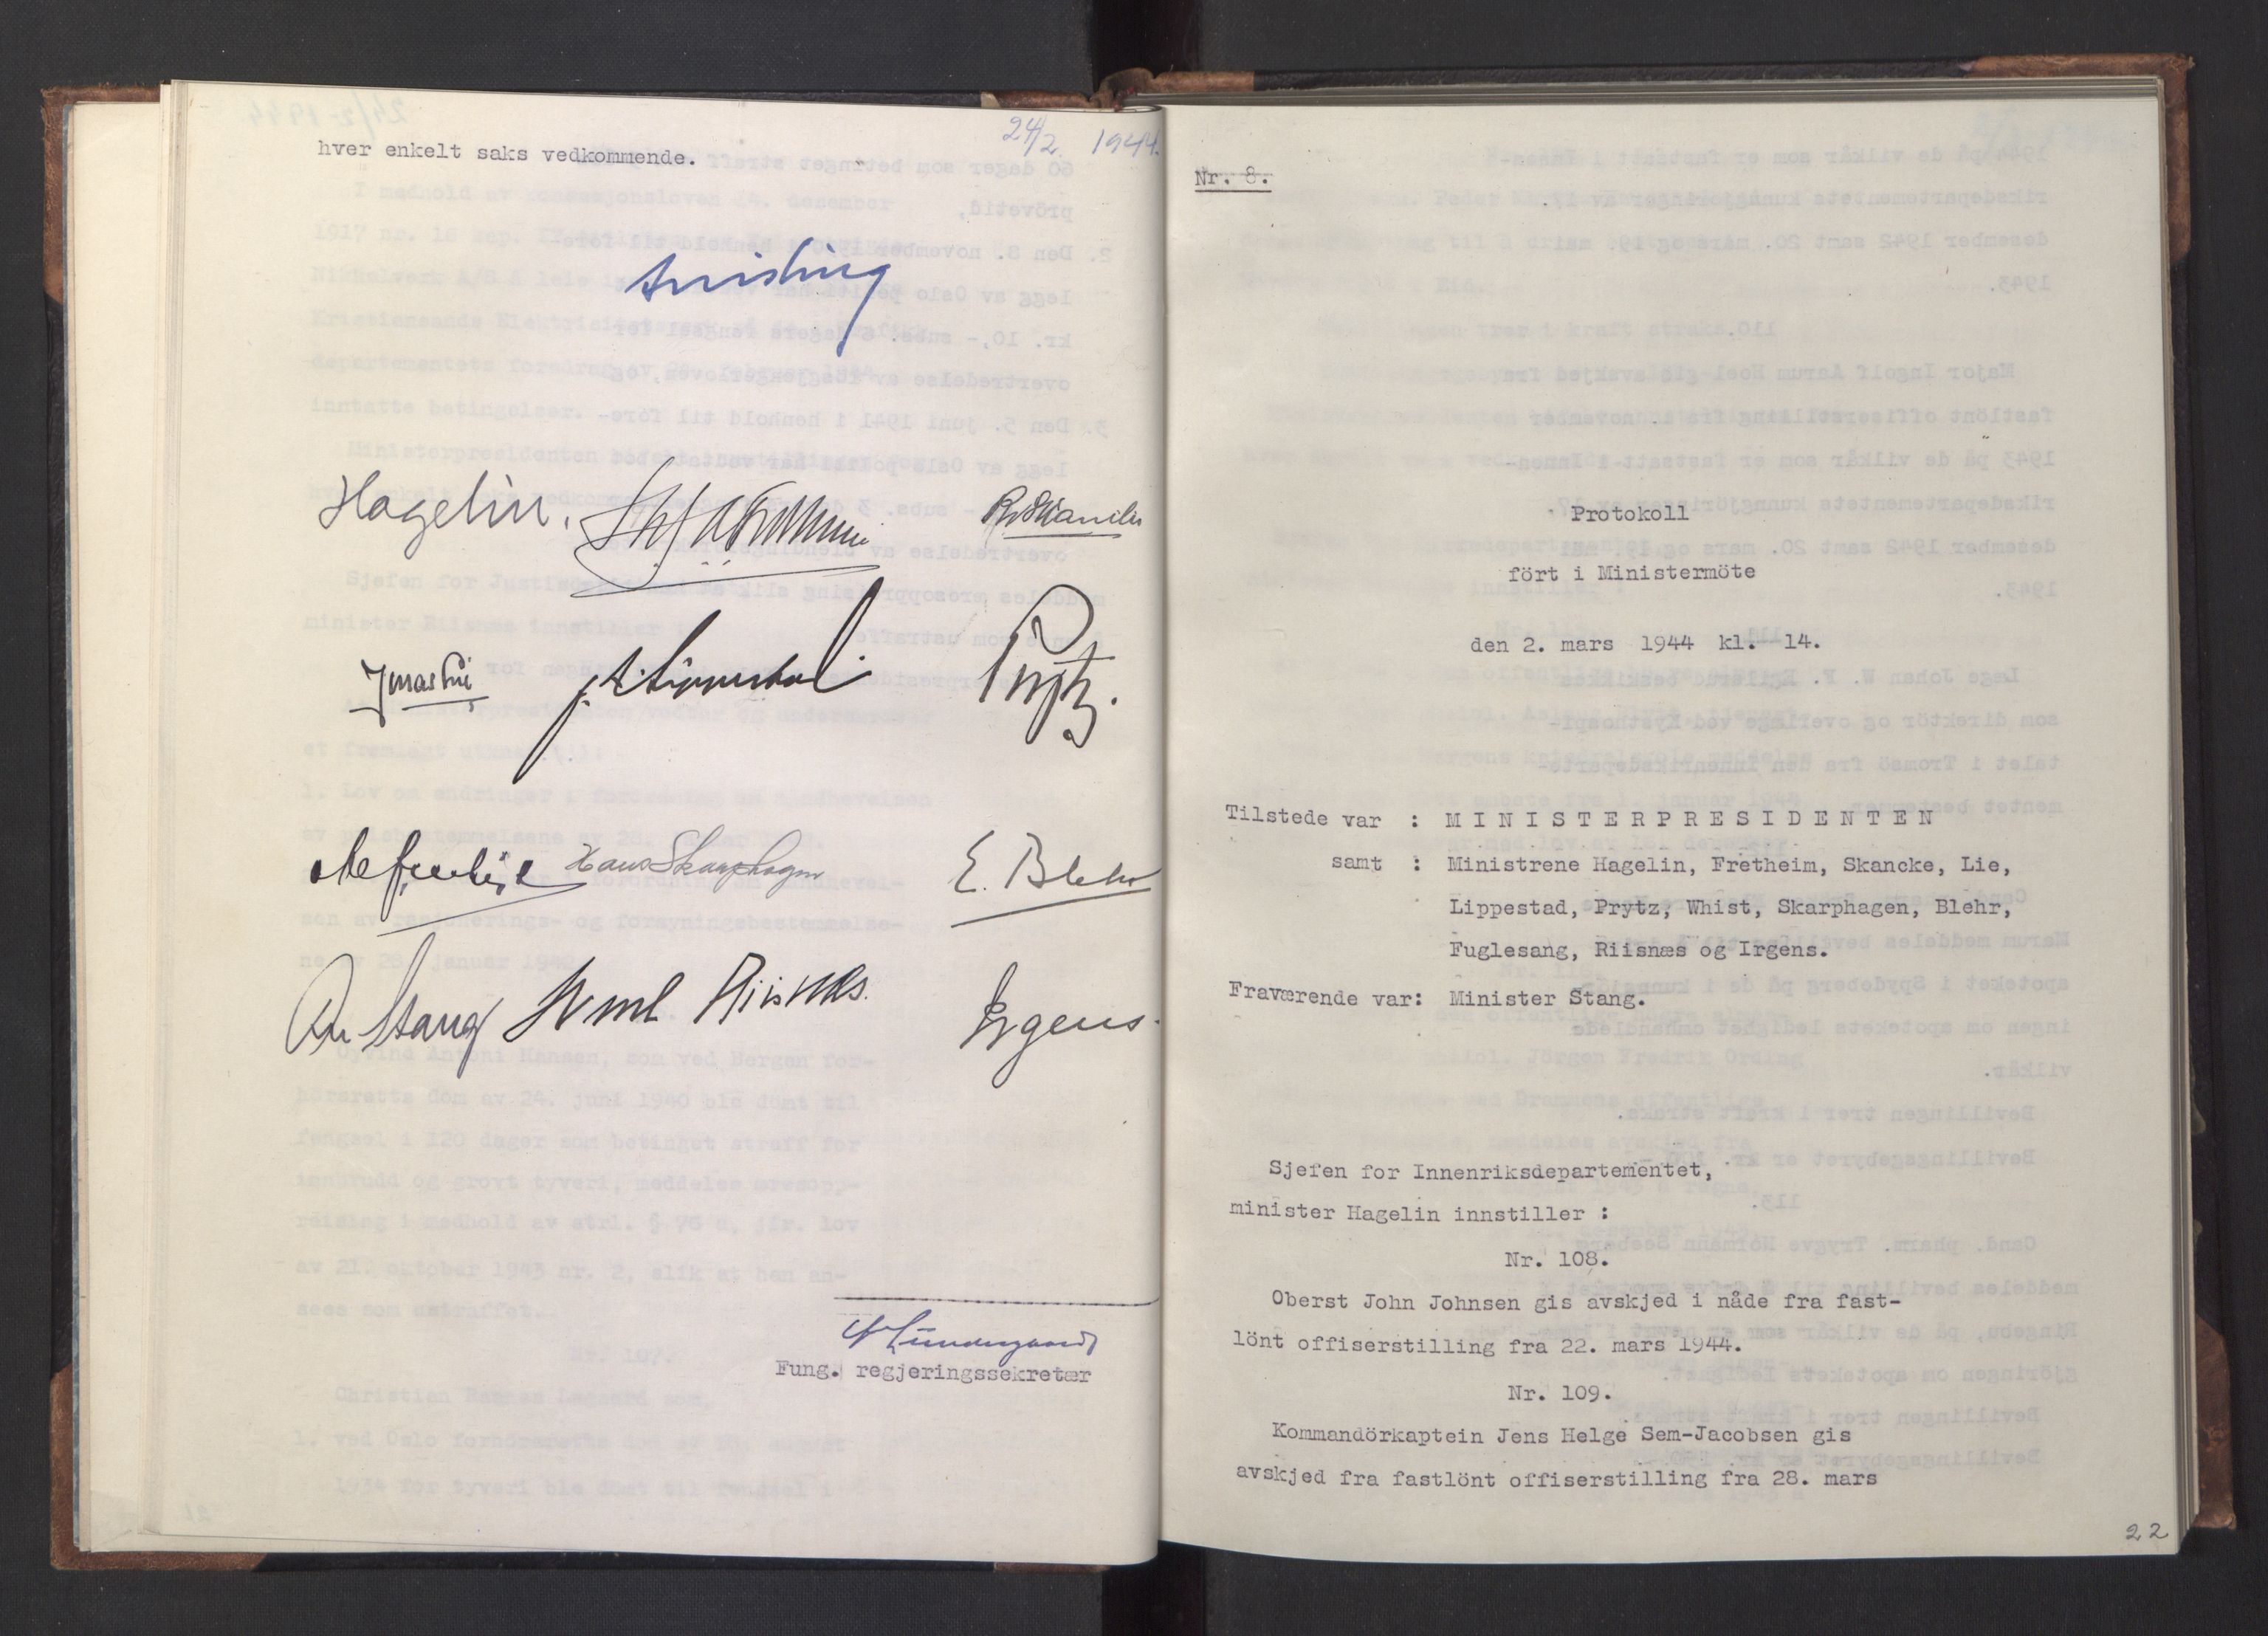 RA, NS-administrasjonen 1940-1945 (Statsrådsekretariatet, de kommisariske statsråder mm), D/Da/L0005: Protokoll fra ministermøter, 1944, s. 21b-22a